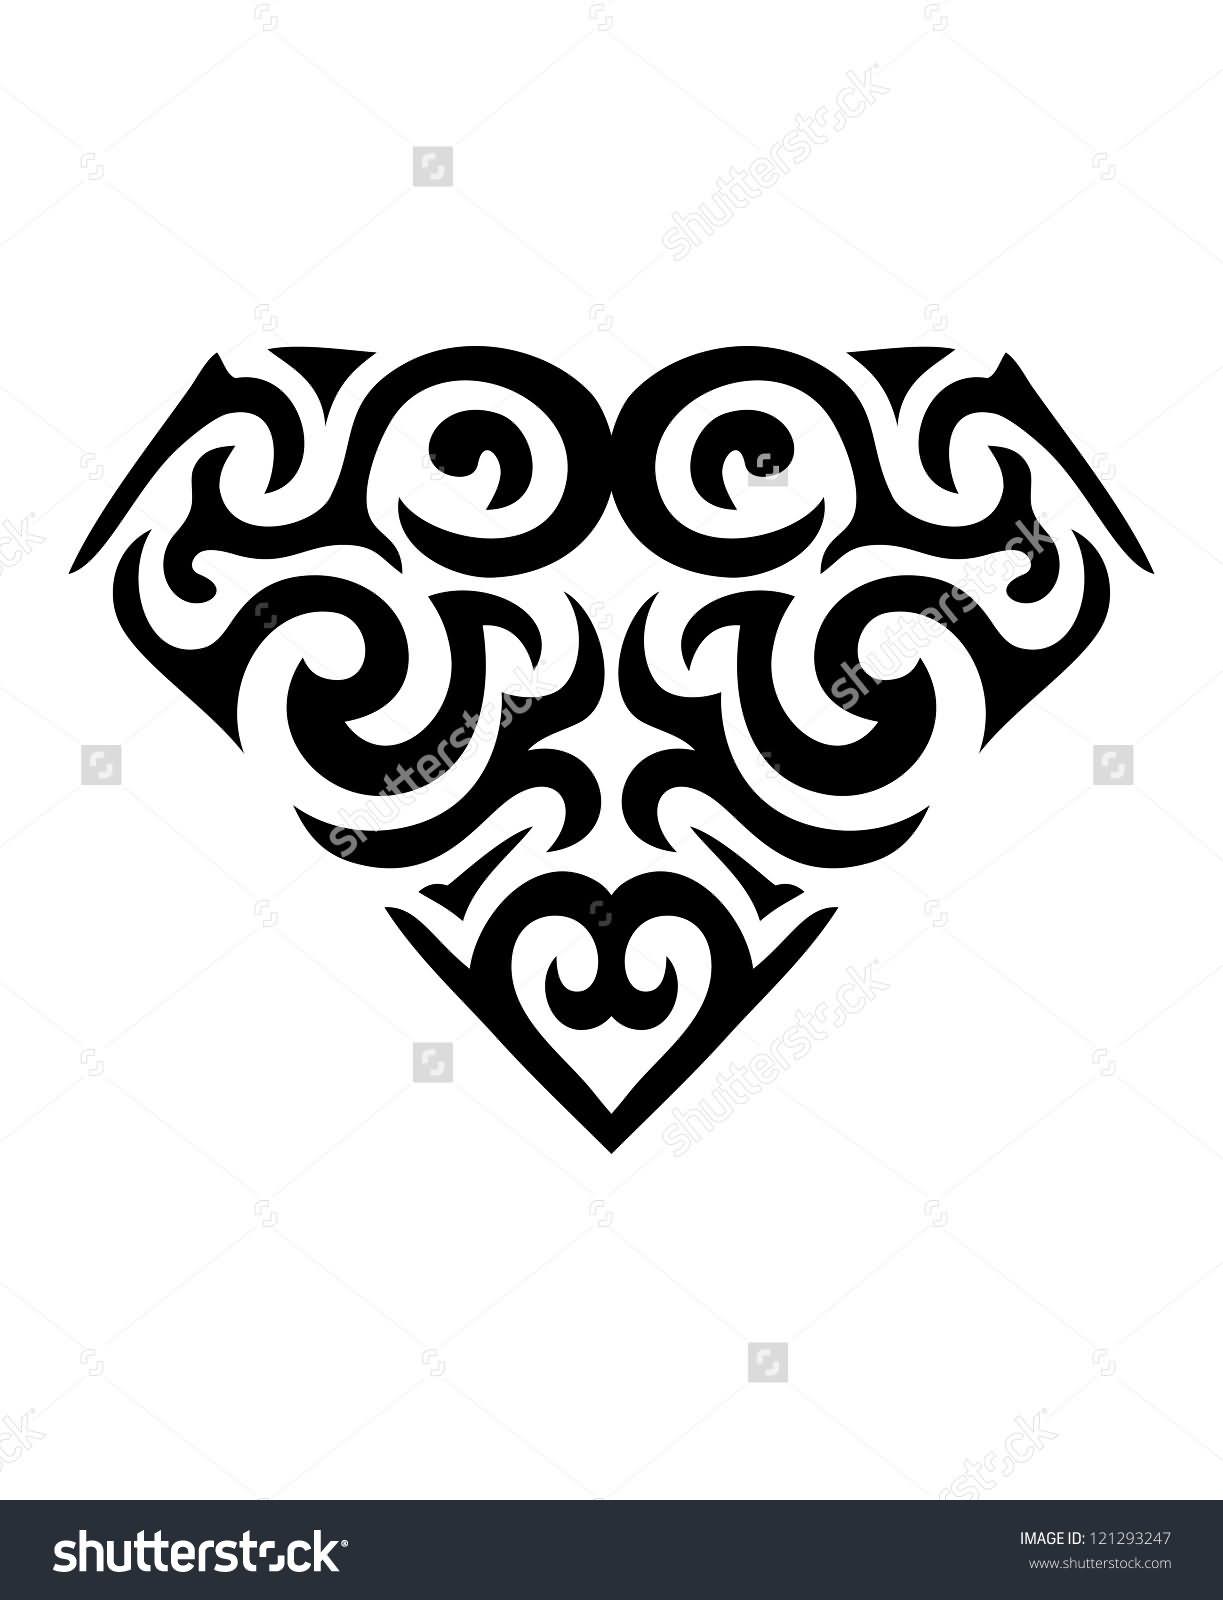 27 latest symbol tattoos designs ideas cool diamond symbol tattoo design biocorpaavc Images